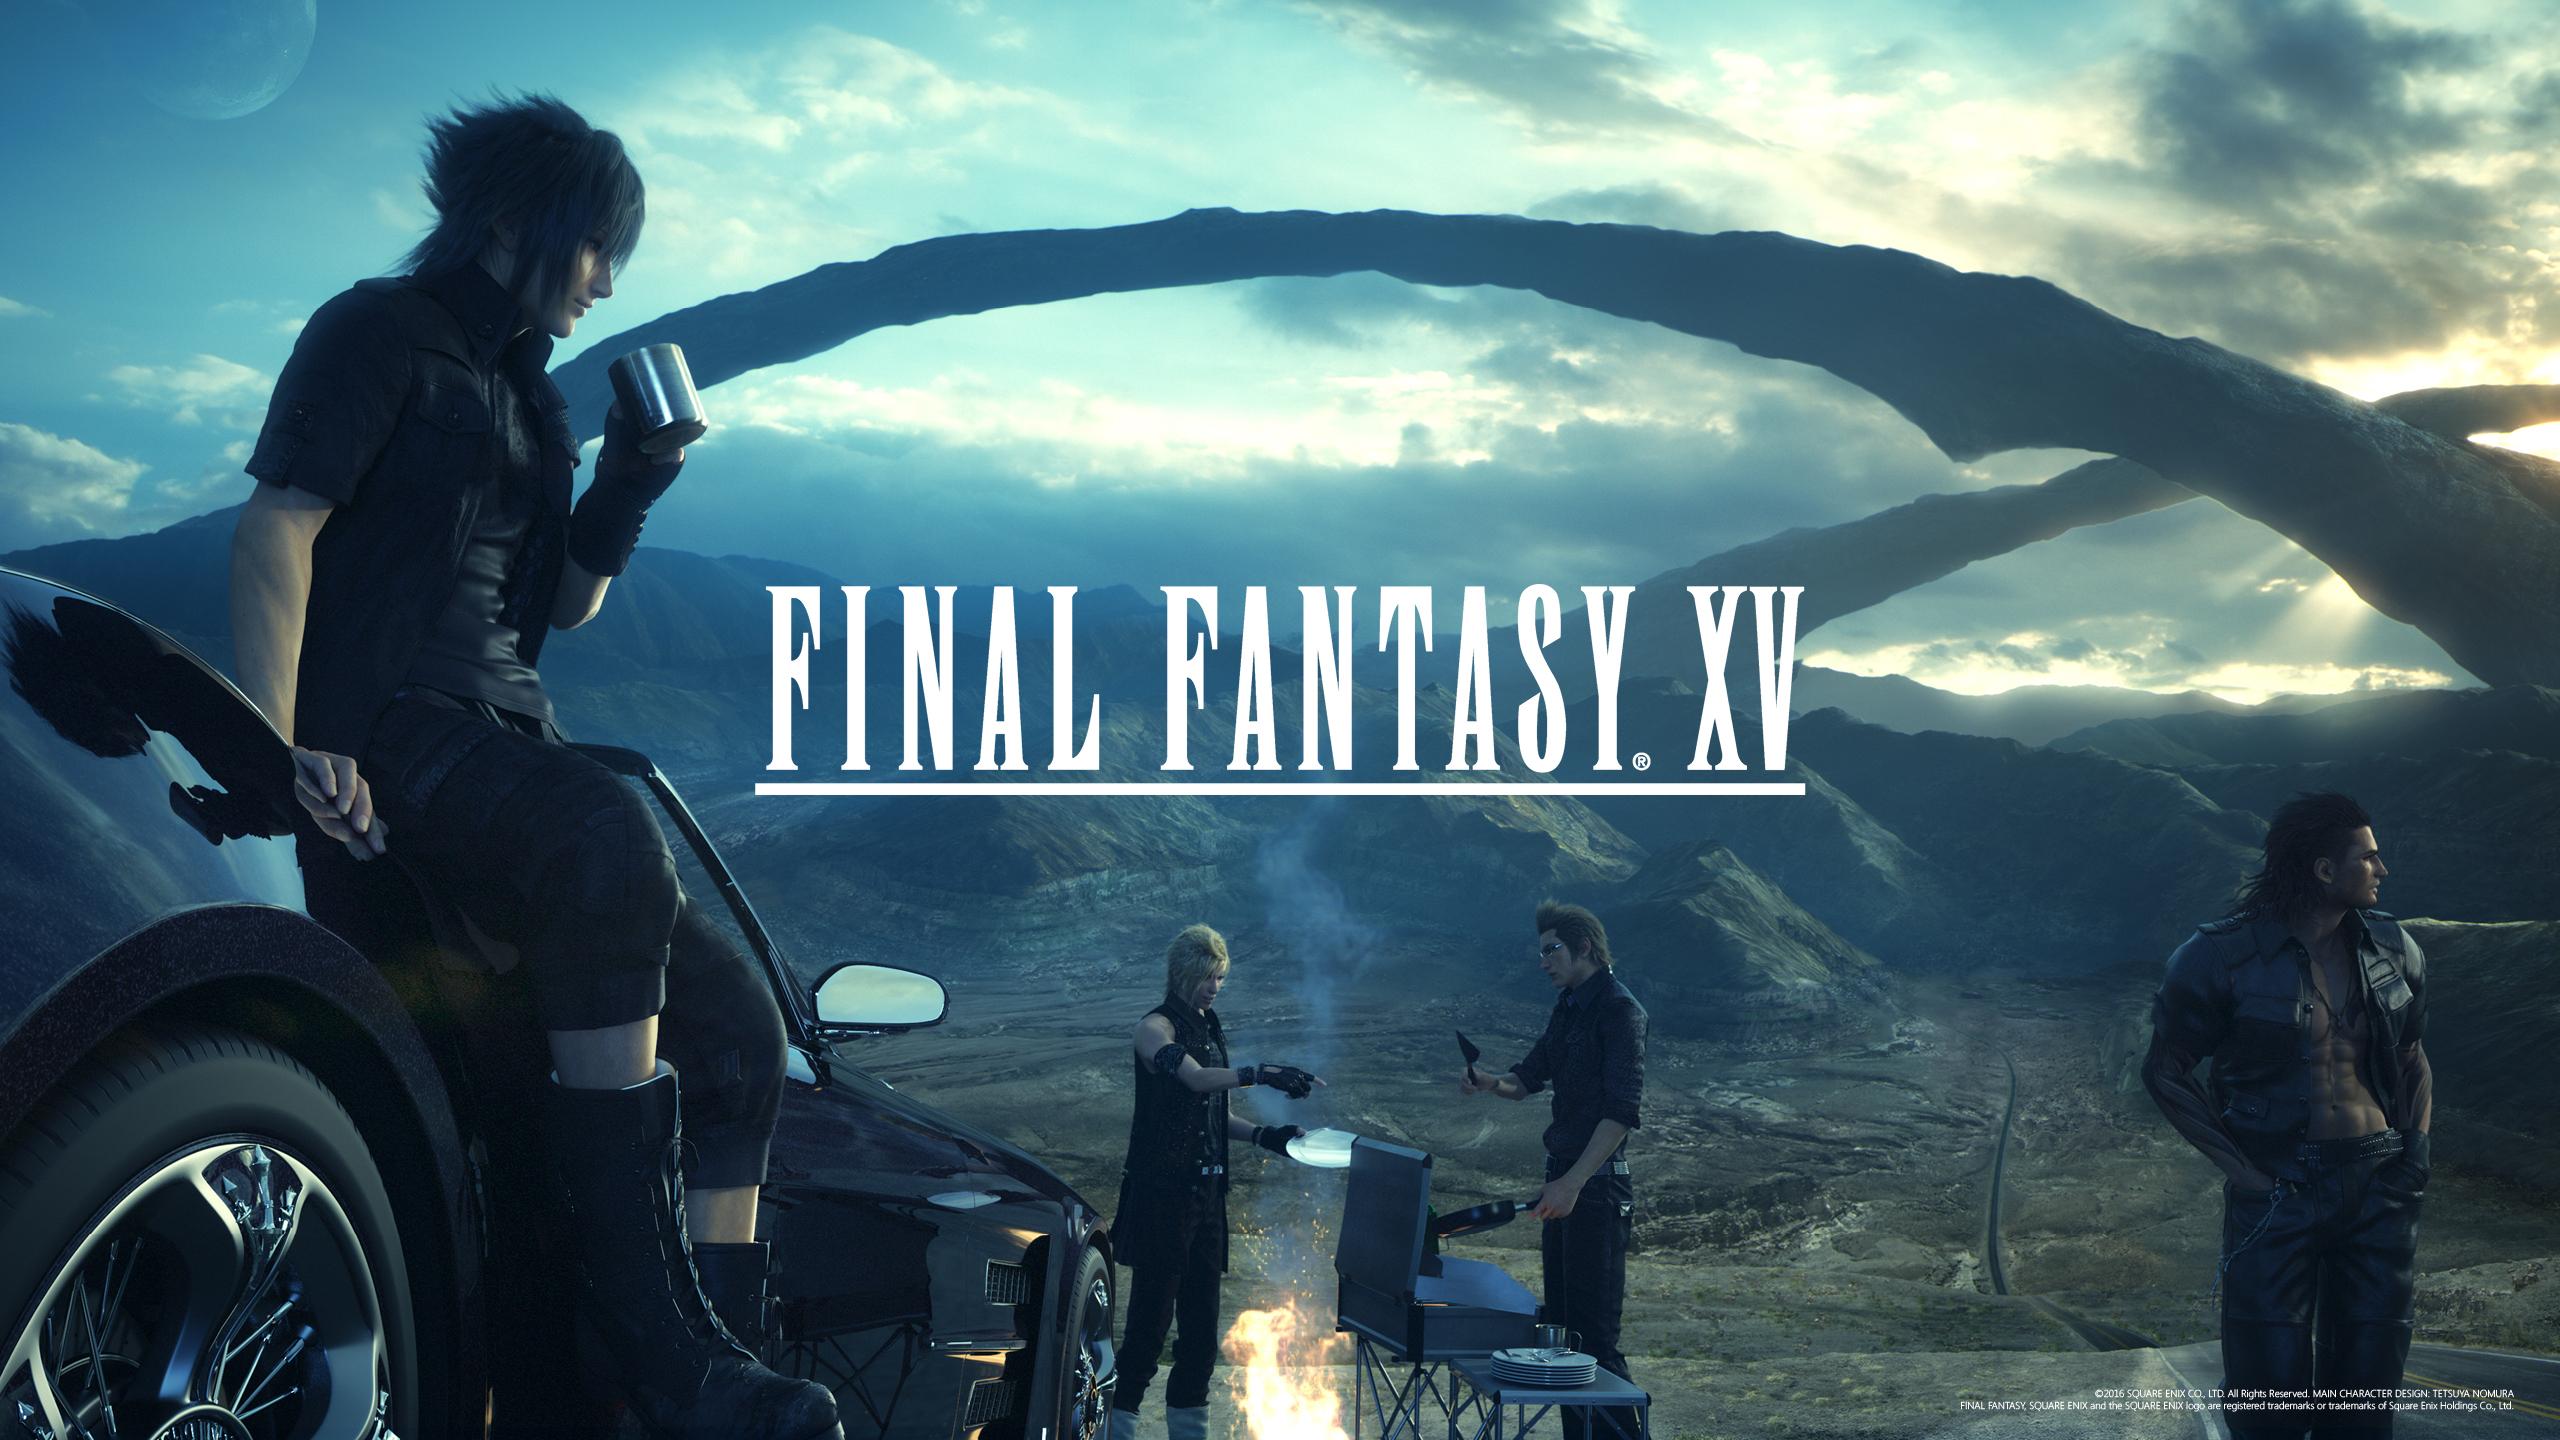 Final Fantasy Xv Wallpaper Iphone X Final Fantasy Xv 2016 Game Wallpapers Hd Wallpapers Id